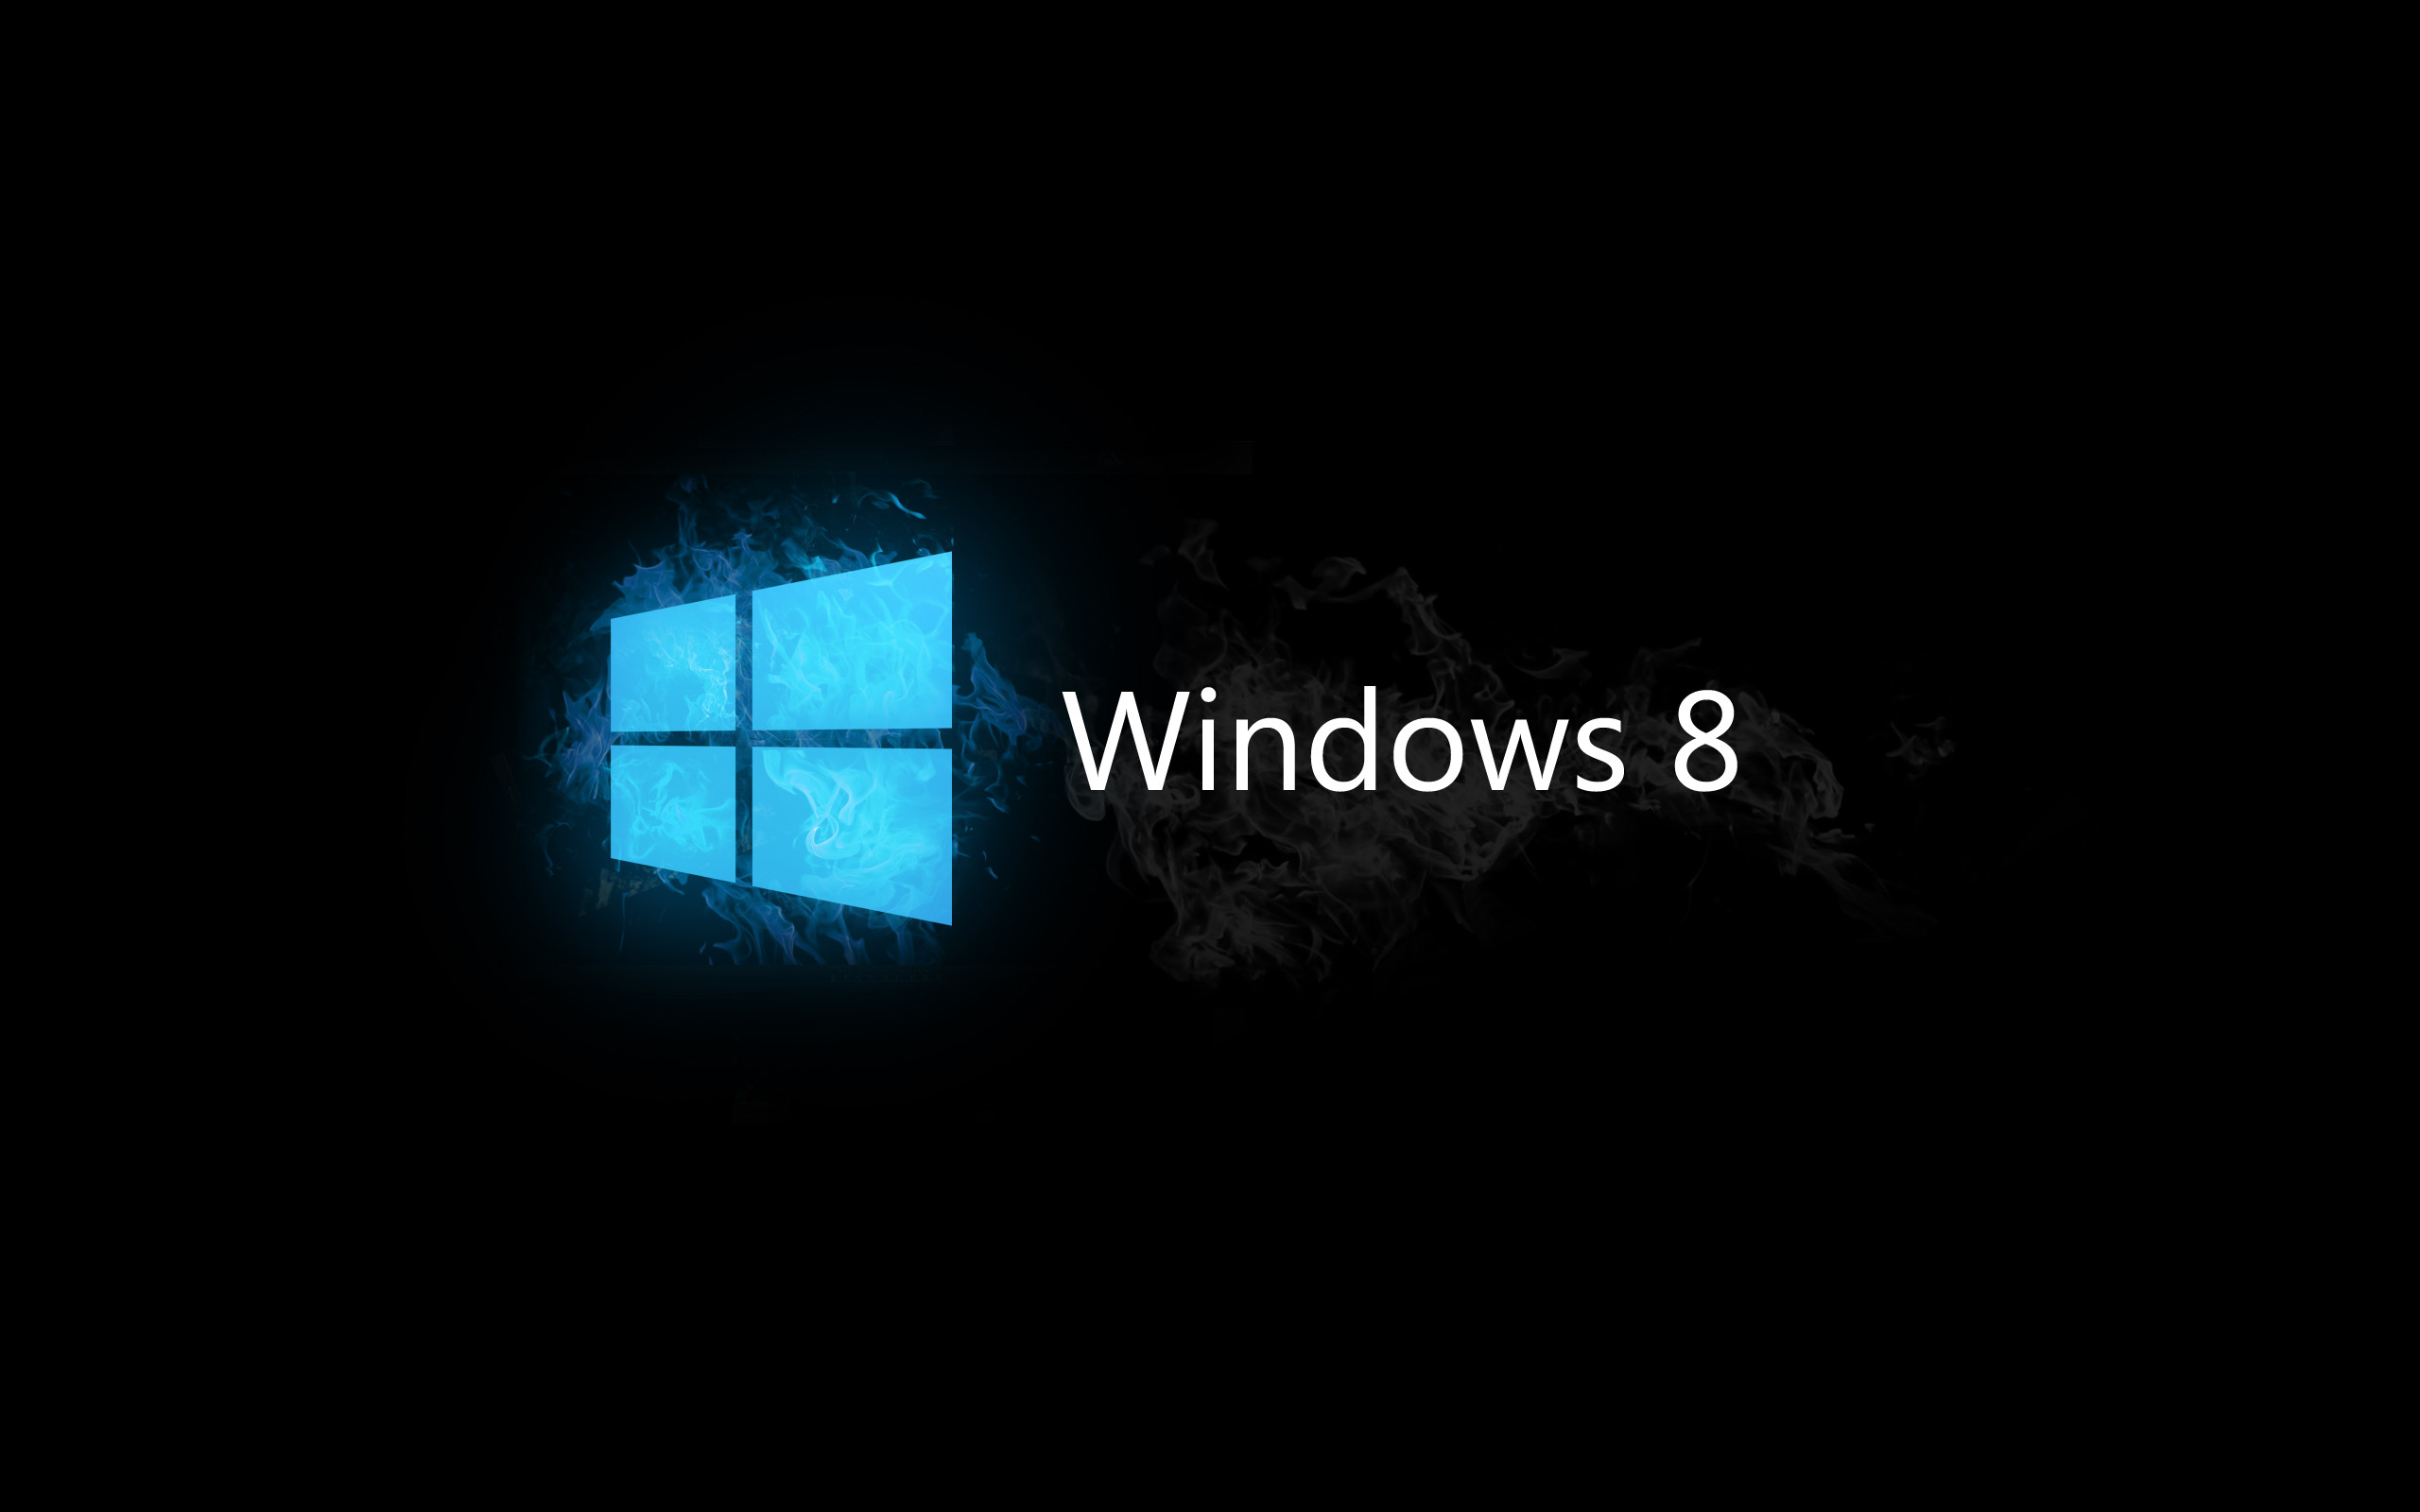 windows 8 wallpaper black 1080p –  https://backgroundwallpaperpics.com/windows-